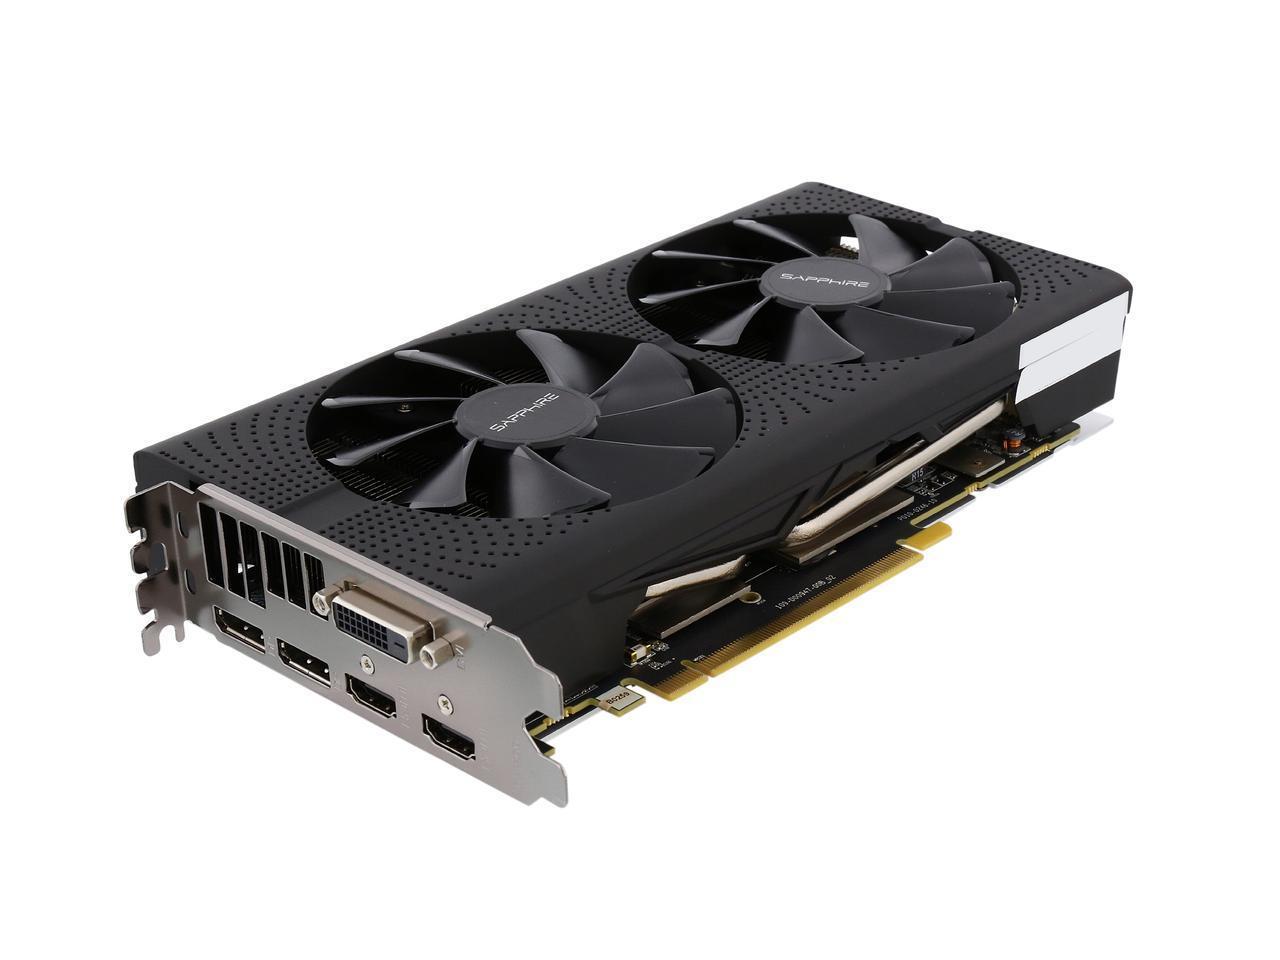 Sapphire PULSE Radeon RX 570 4GB GDDR5 PCI-E Dual HDMI / DVI-D / Dual DP OC w/ Backplate (UEFI), 100412P4GOCL - $119.99 AC/FS